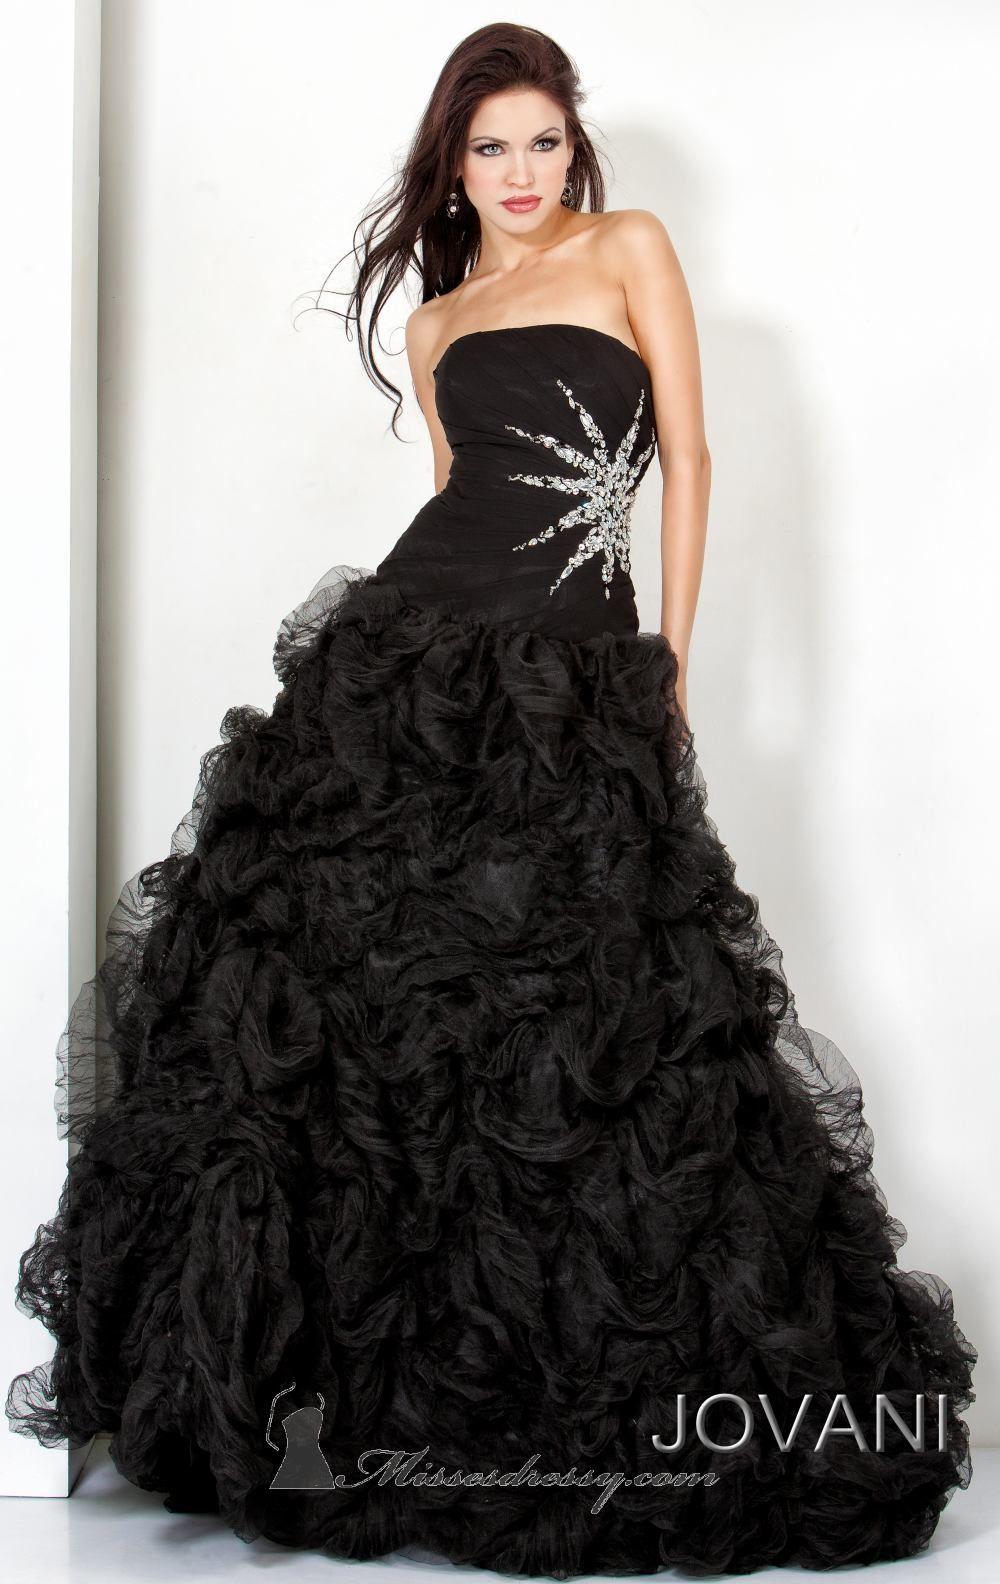 Jovani dress available at missesdressy evening